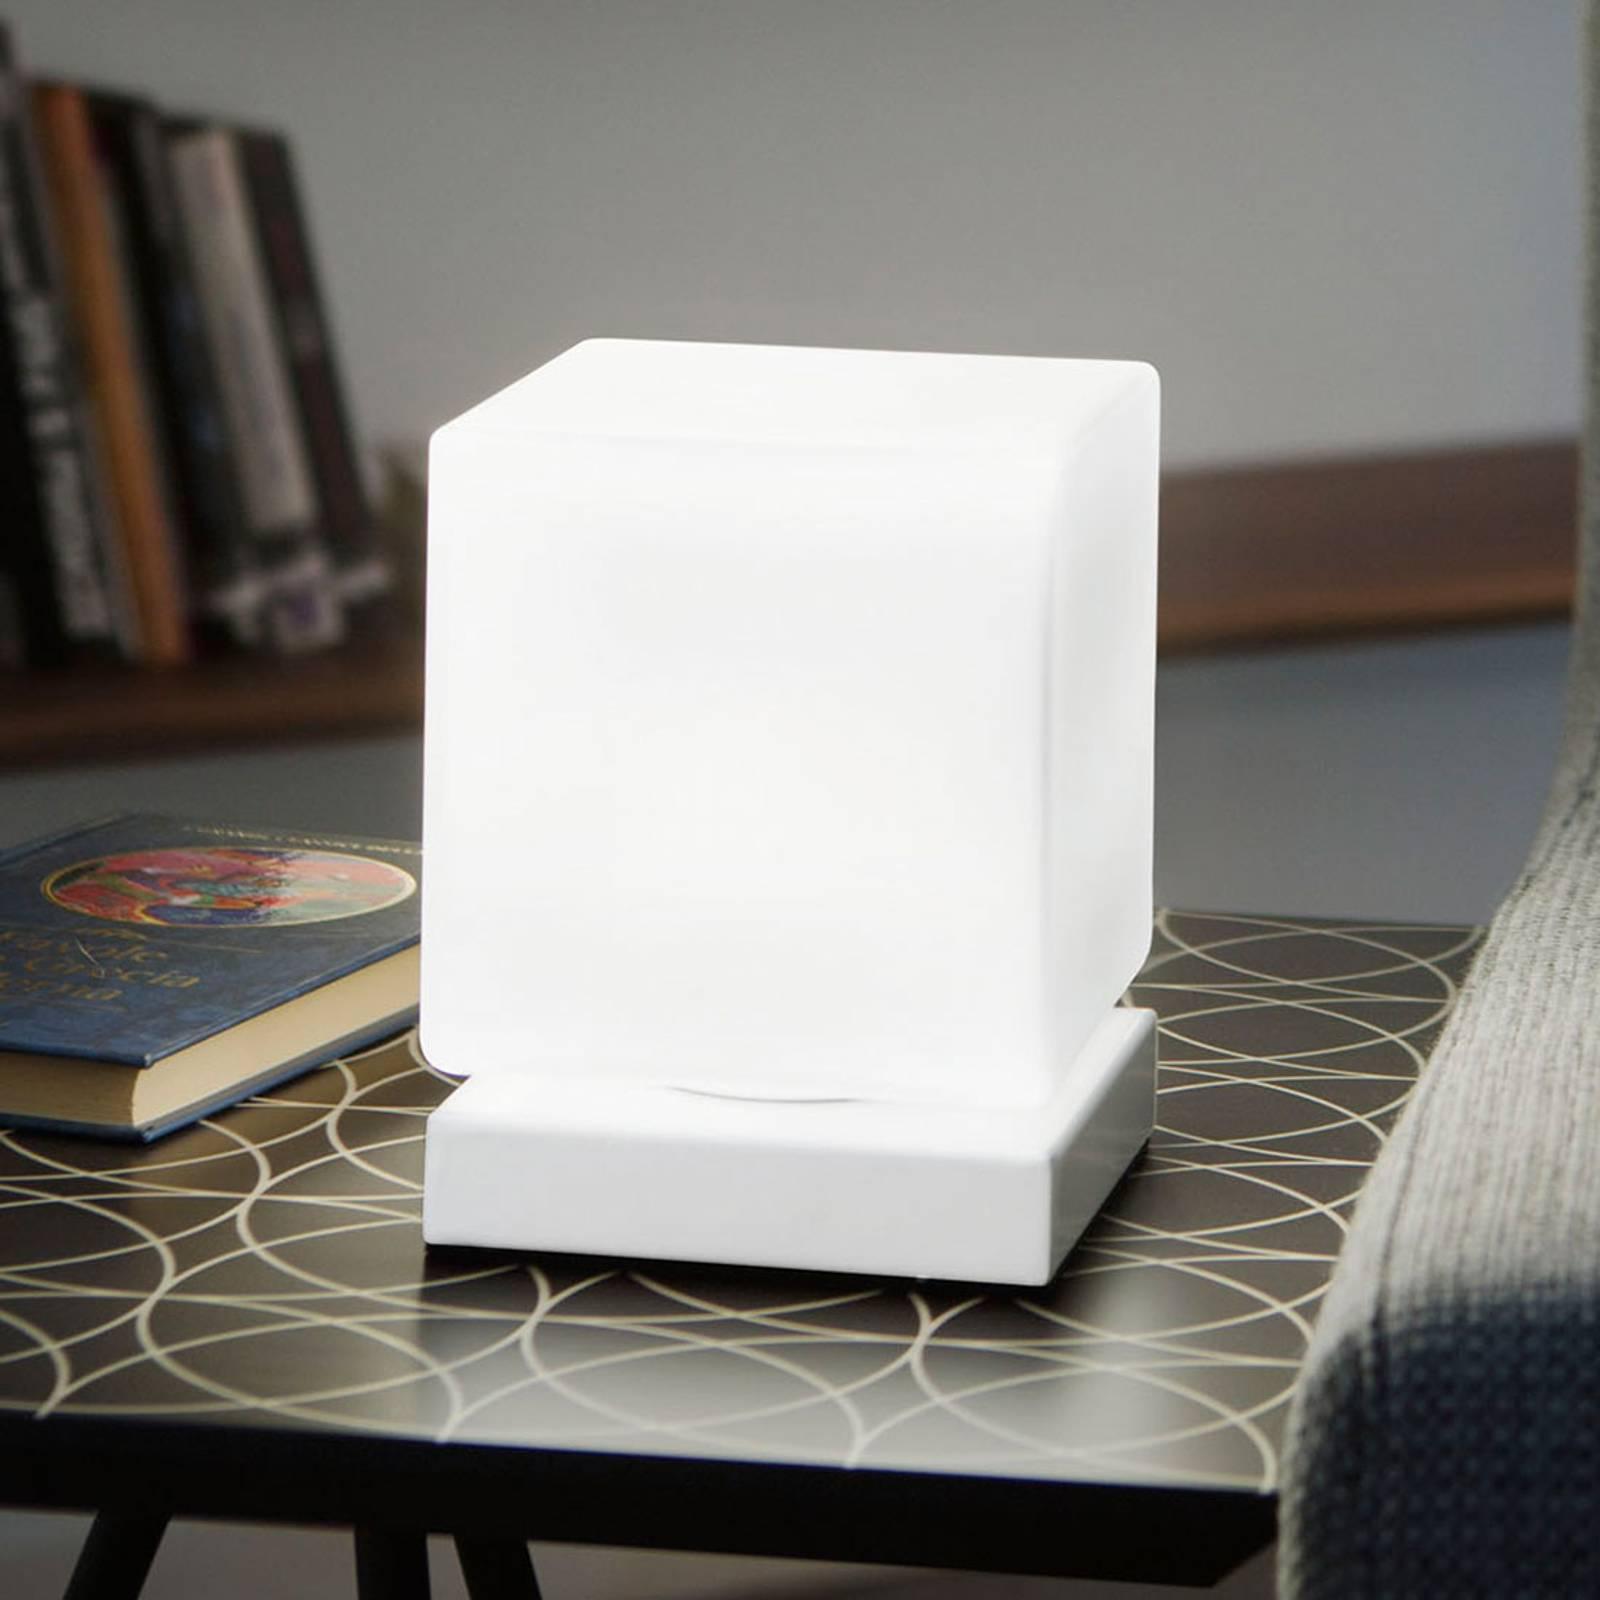 Lampe à poser LED Brenta blanche avec variateur